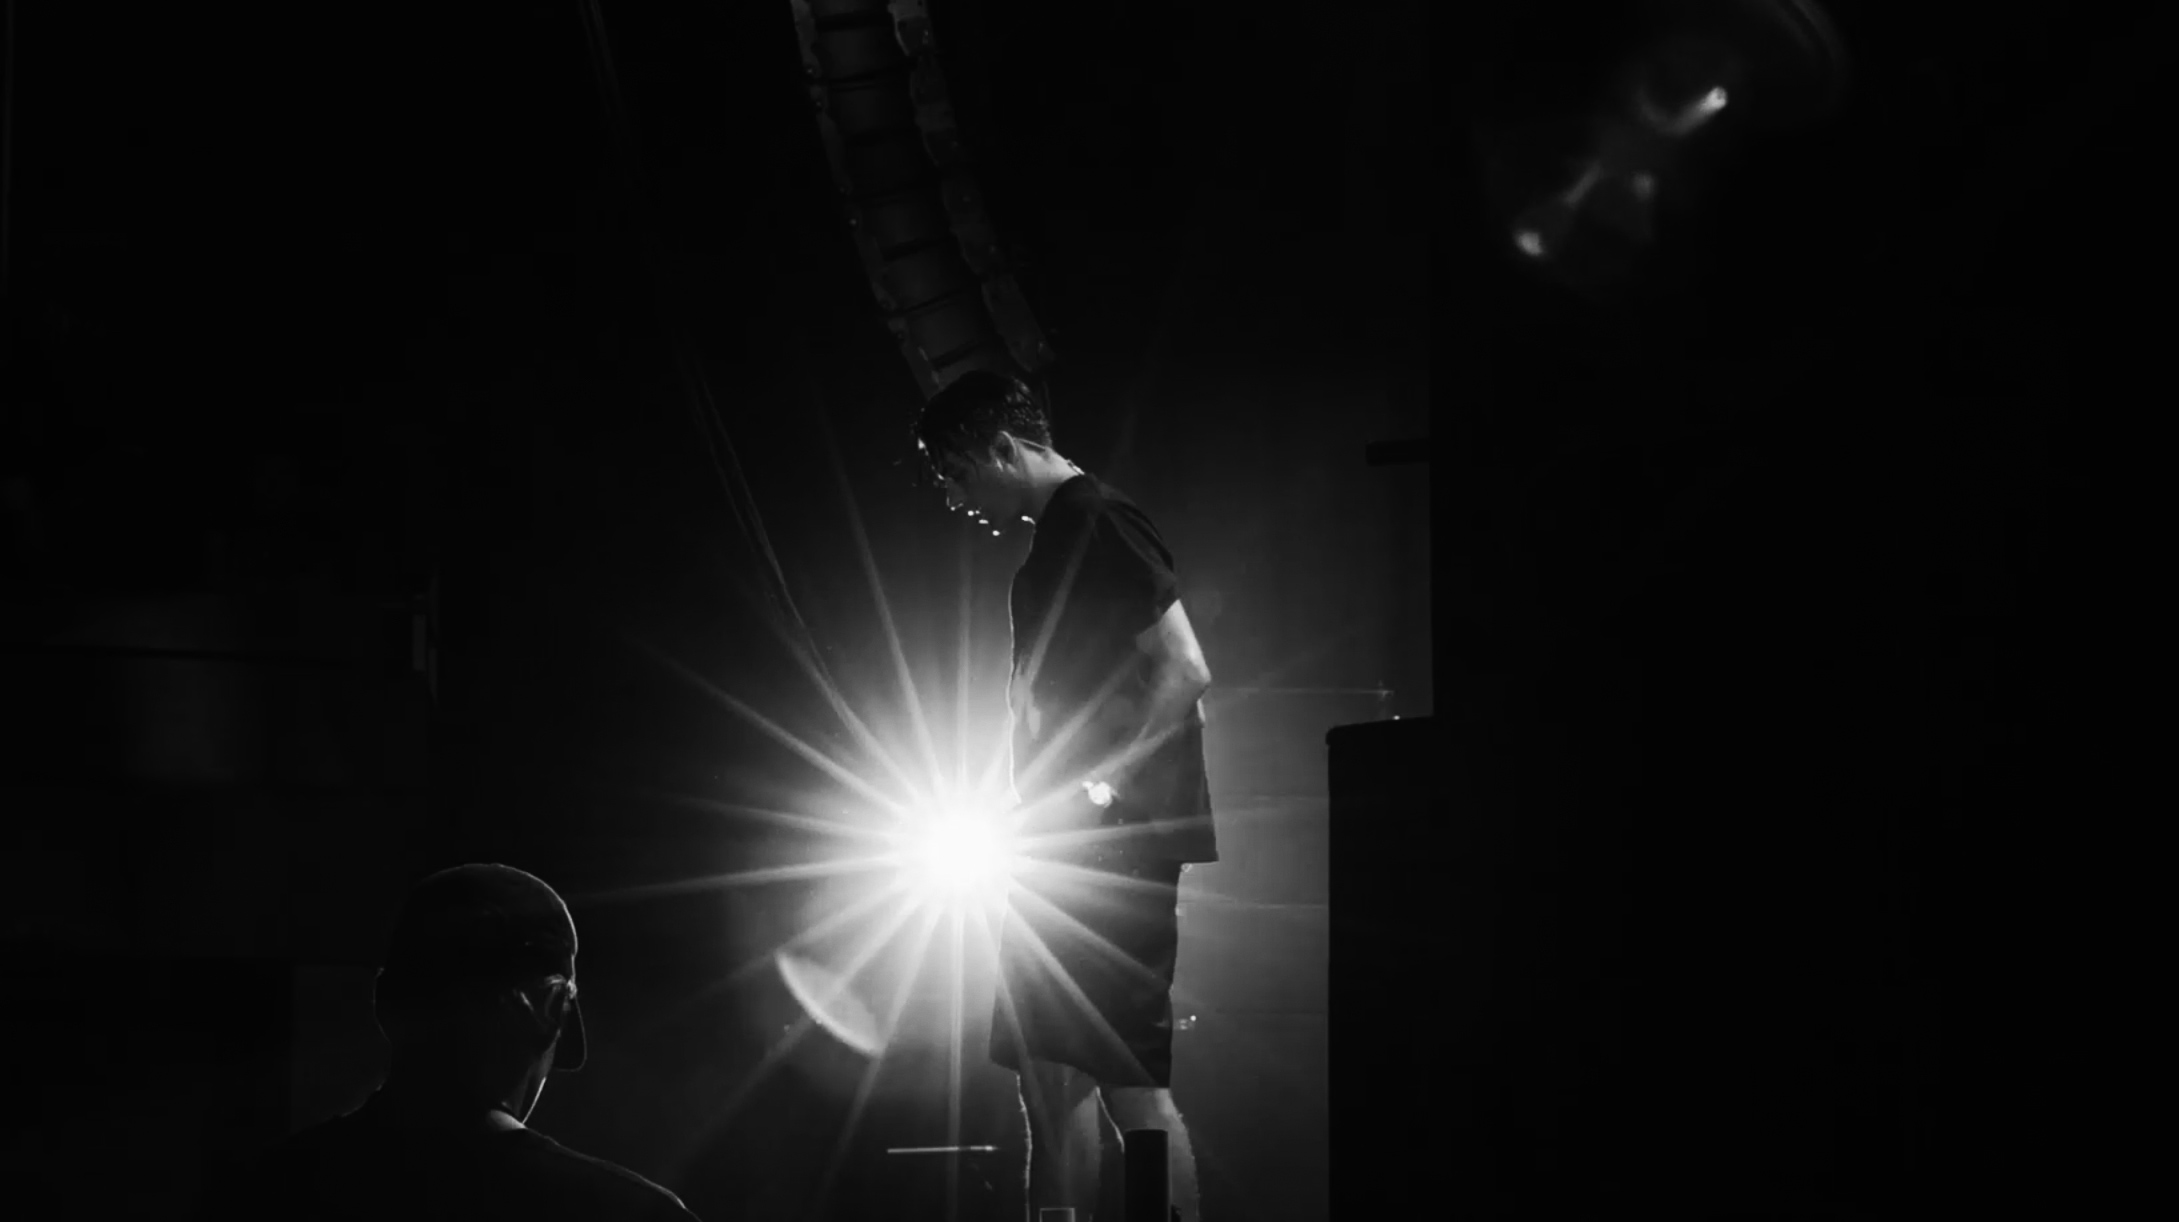 Niklas Nischke - Yung Pinch G-Eazy Berlin Tourtsop 07.jpg